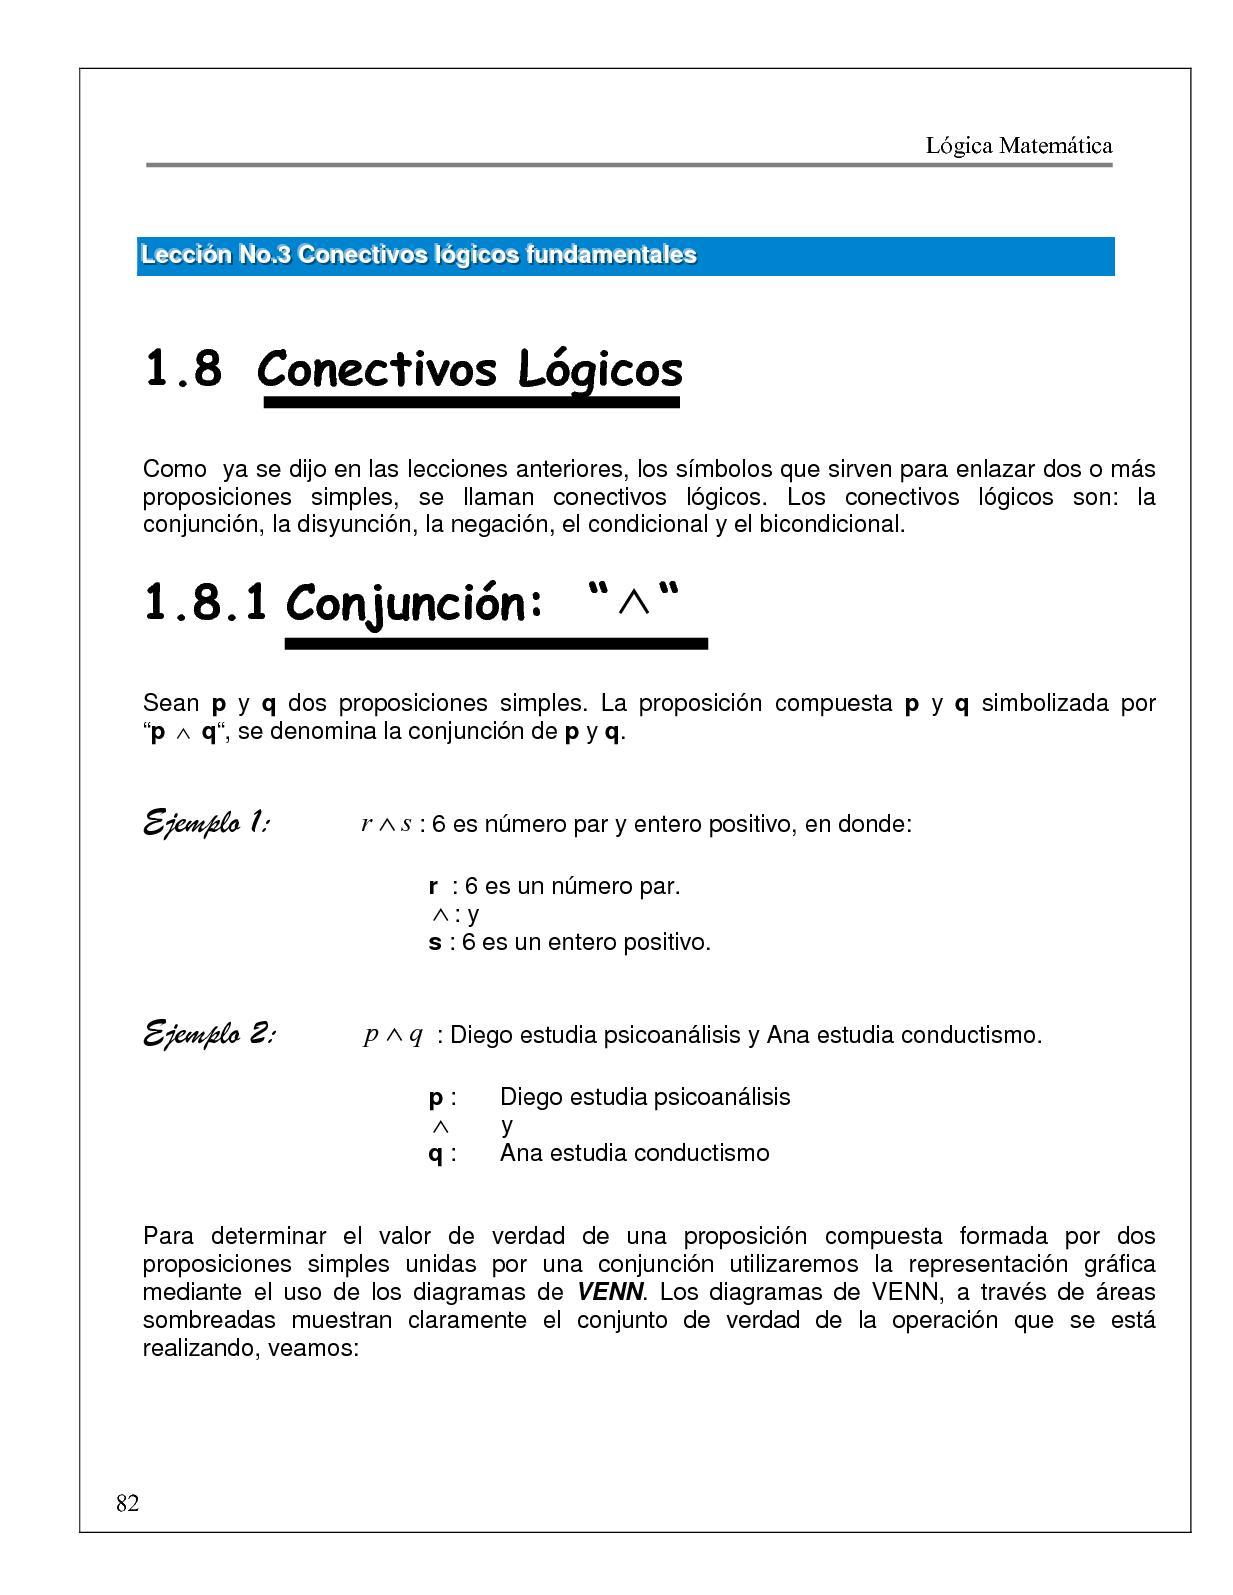 Modulo De Logica Matematica 90004 2012 - CALAMEO Downloader